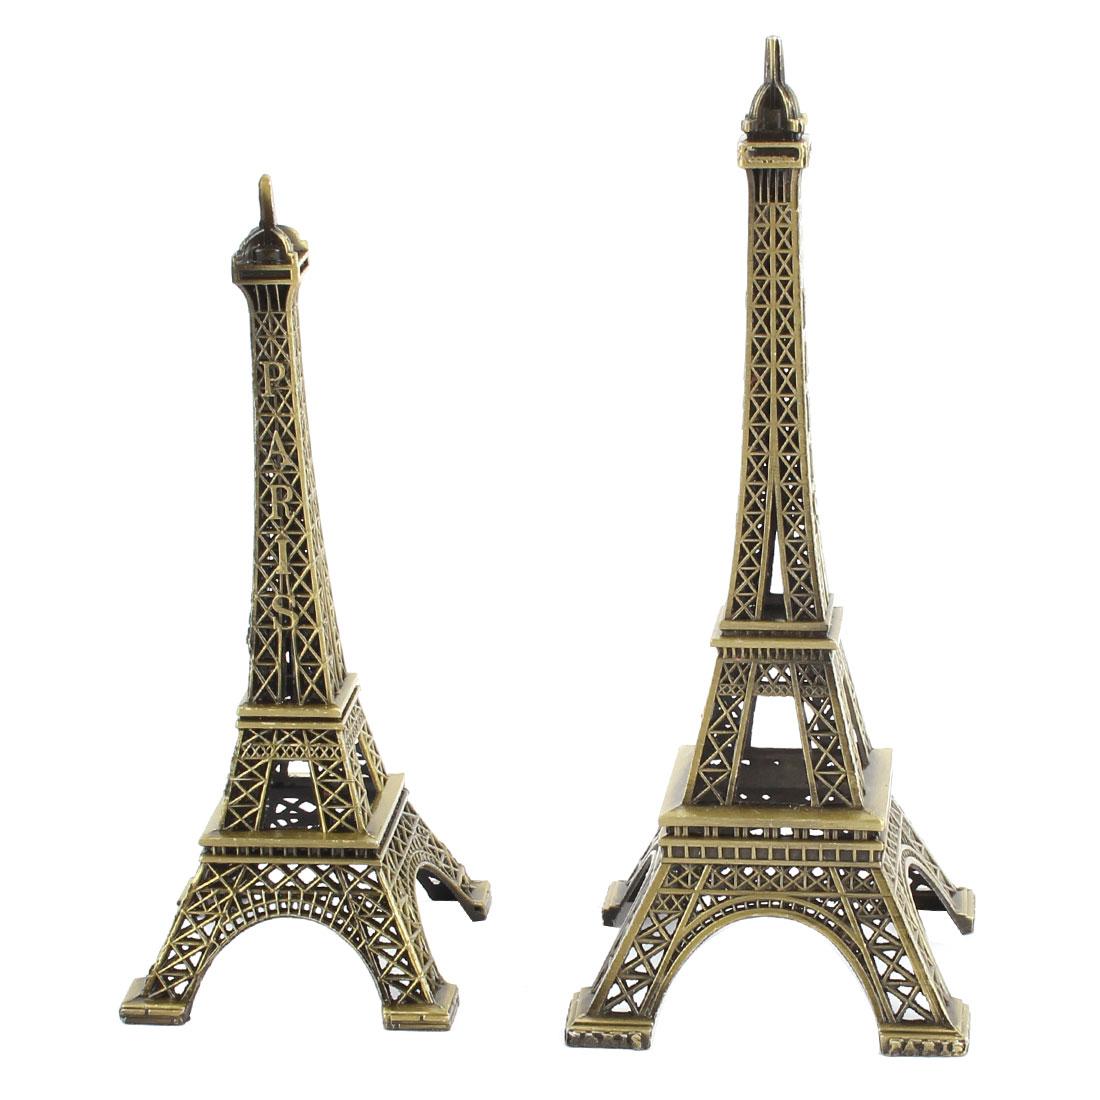 Apartment Metal Miniature Statue Eiffel Tower Model Souvenir Ornament 2 in 1